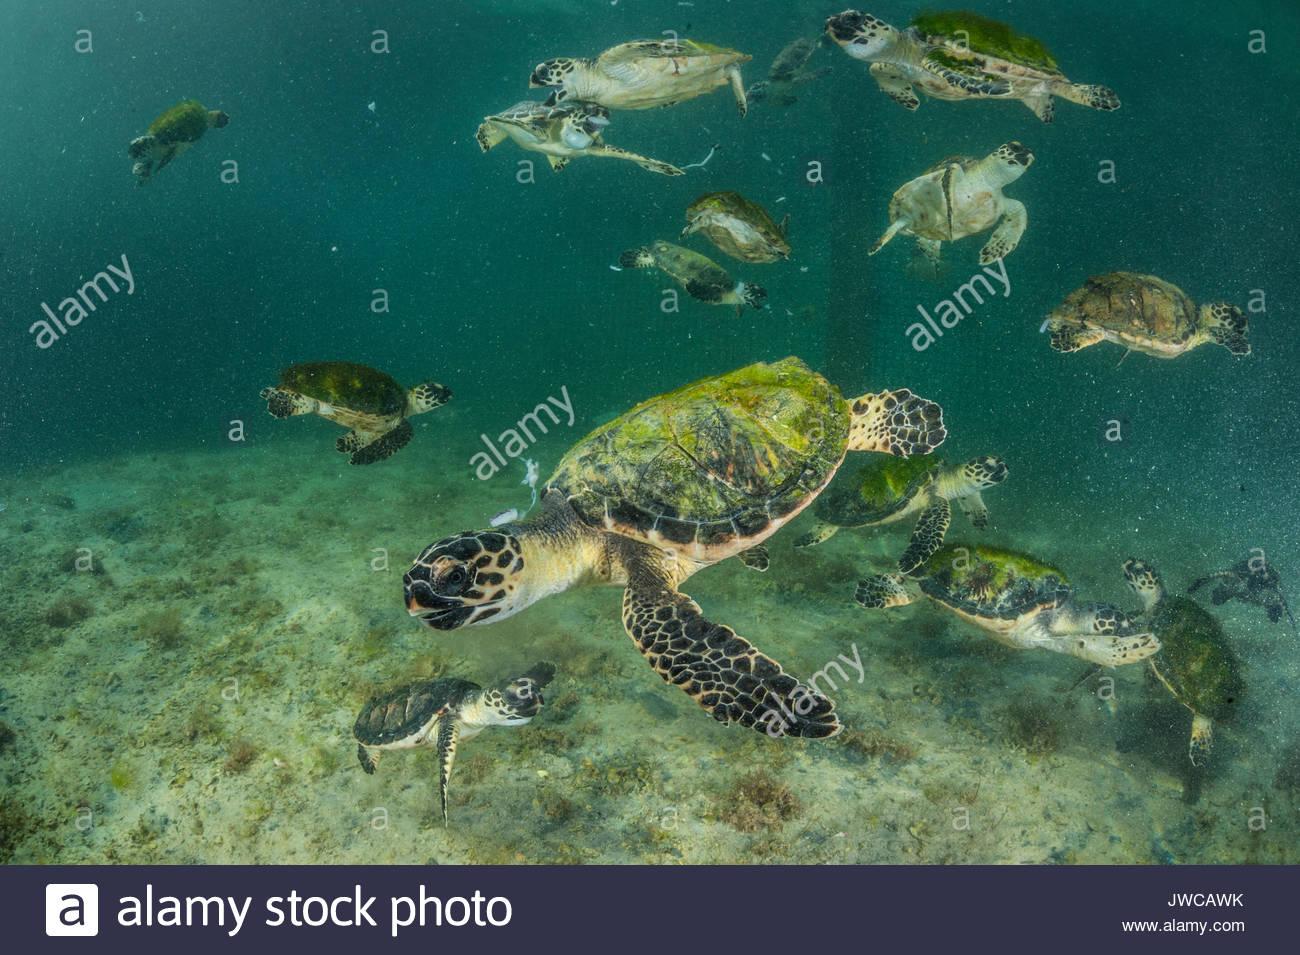 Rescued sea turtles at the Dubai Turtle Rehabilitation Project based at Burj Al Arab. - Stock Image